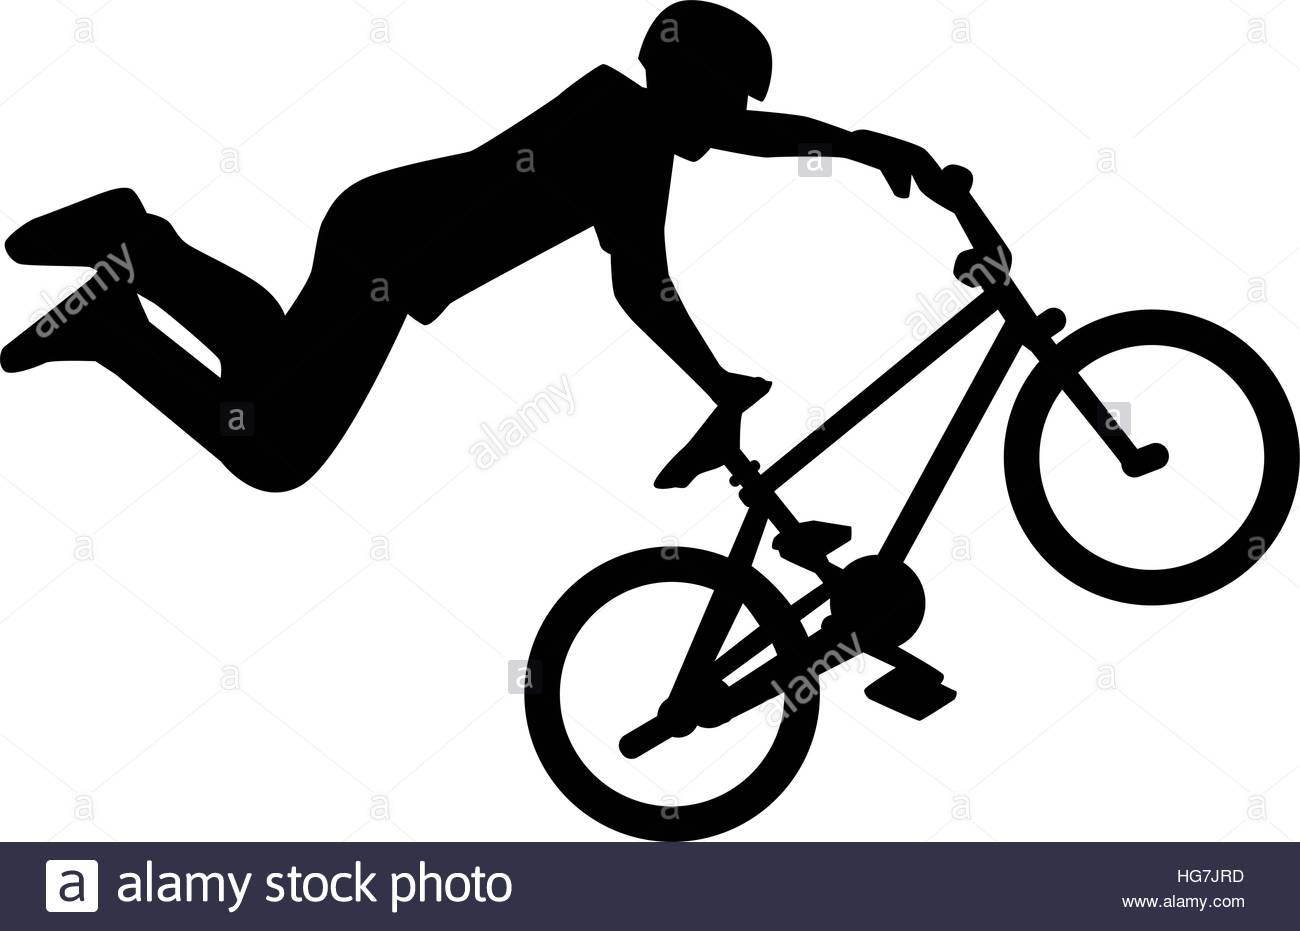 1300x931 Silhouette Of Bmx Rider Stunt Stock Vector Art Amp Illustration